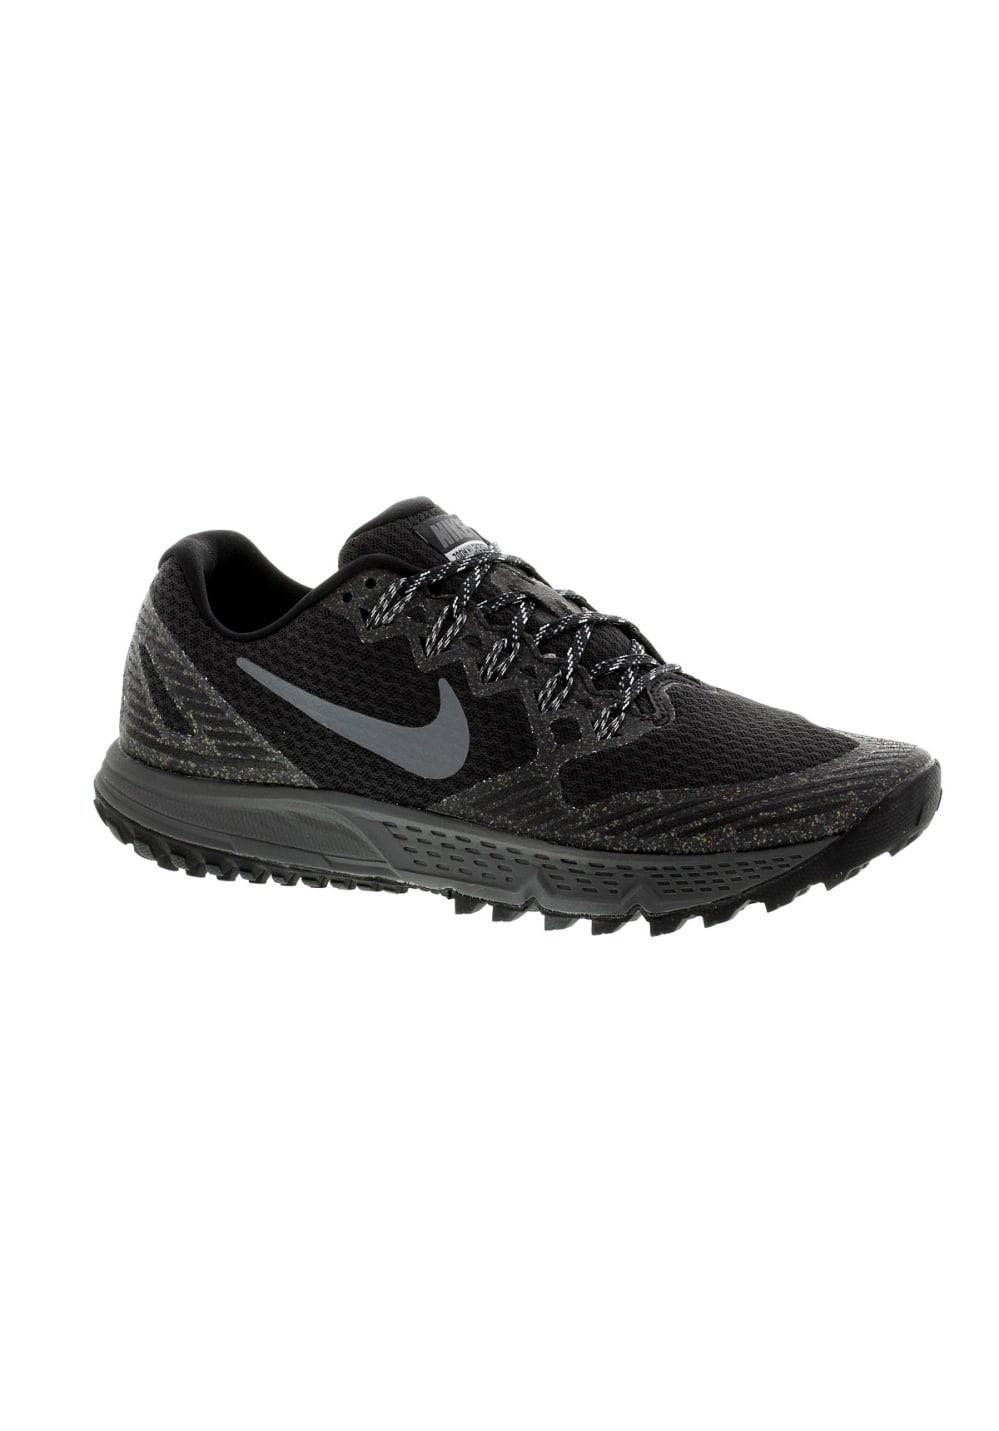 Chaussure Mogo Homme Jogging Giqrgcw Adural Nike 53jALq4R